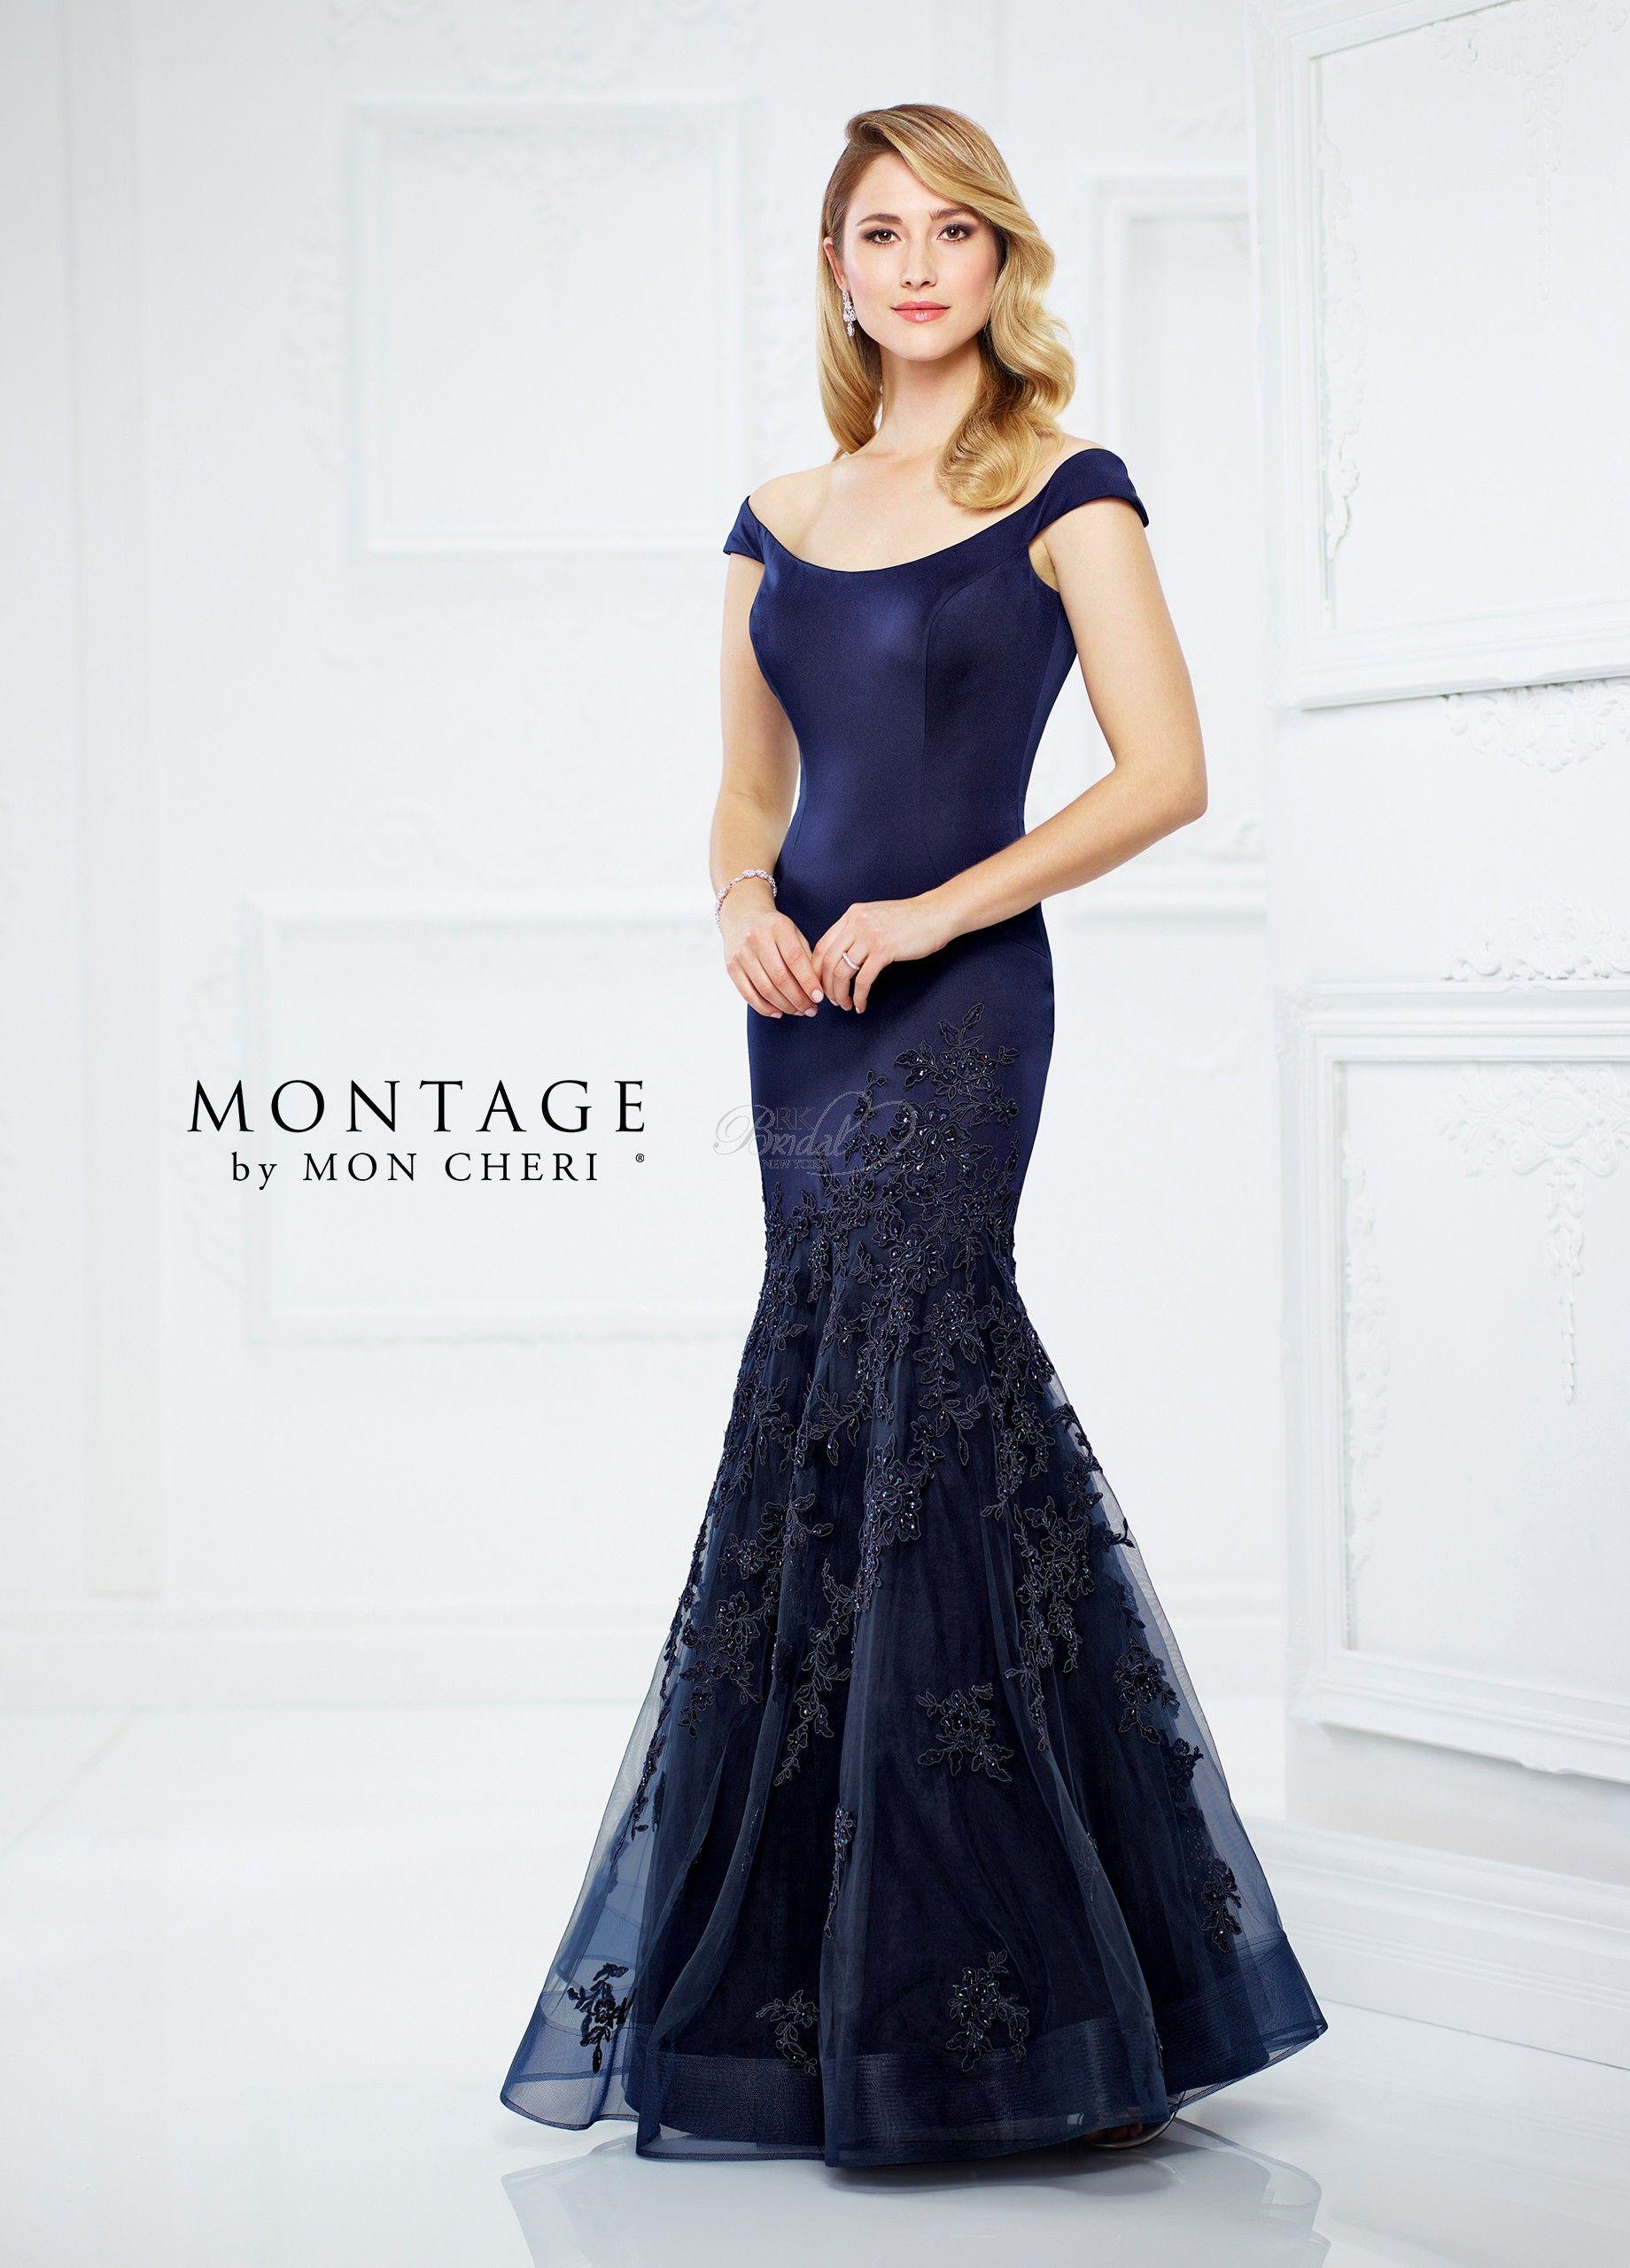 Montage by mon cheri fall style dress pinterest